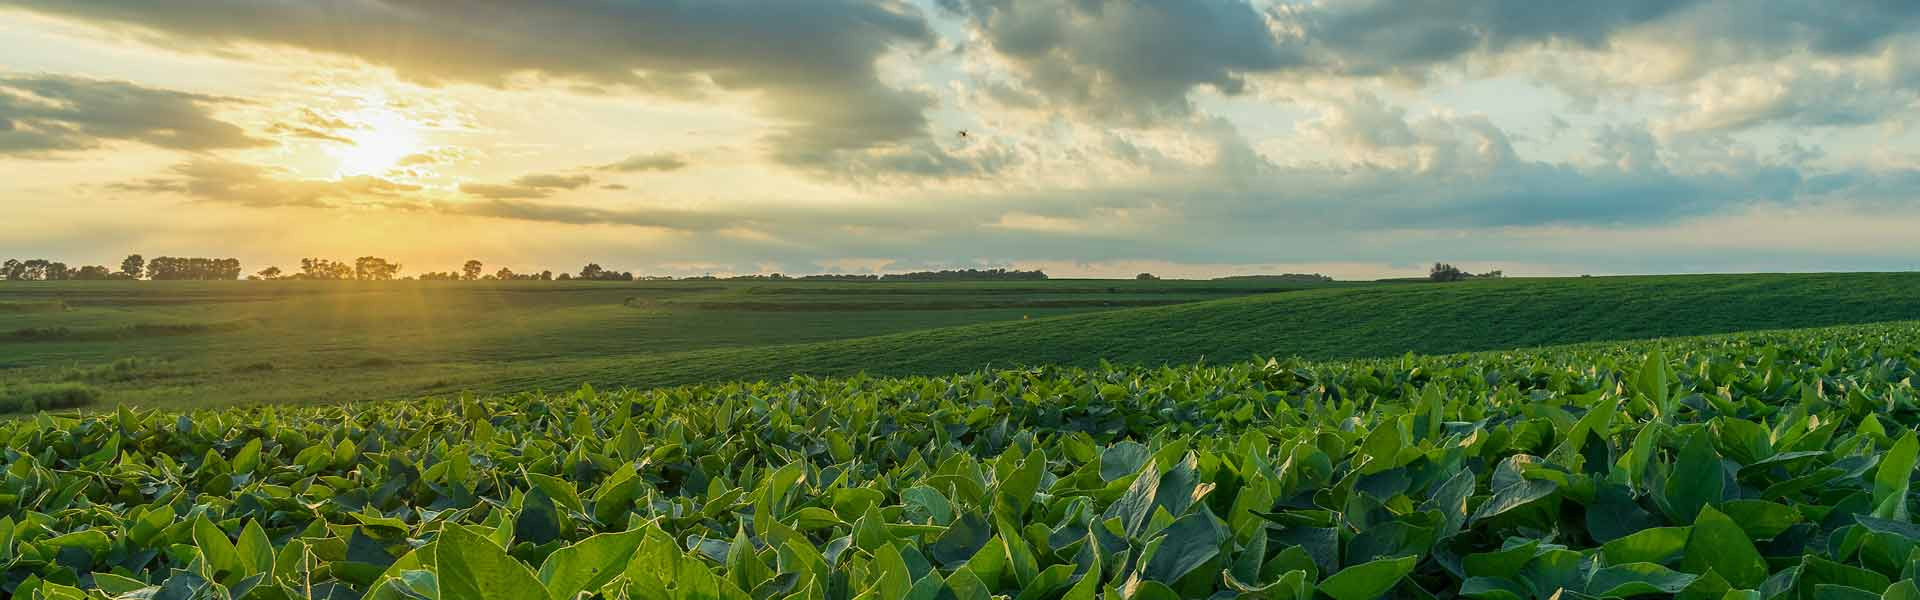 ScotusCentralCatholic-PrivateDay-Nebraska-USA-StateOverview